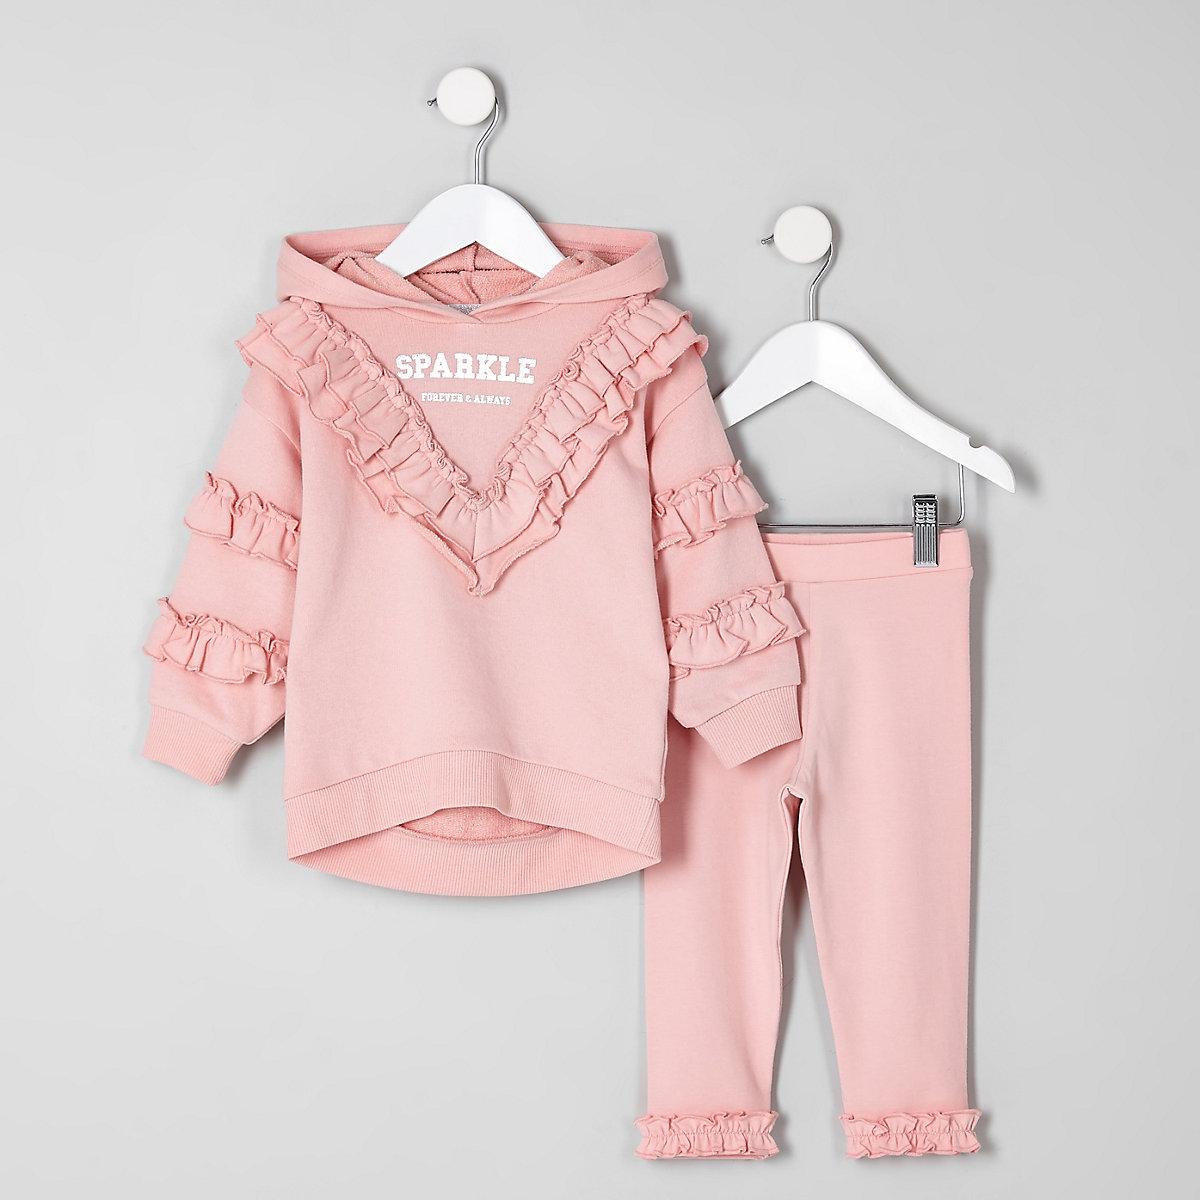 Mini girls pink 'sparkle' sweatshirt outfit